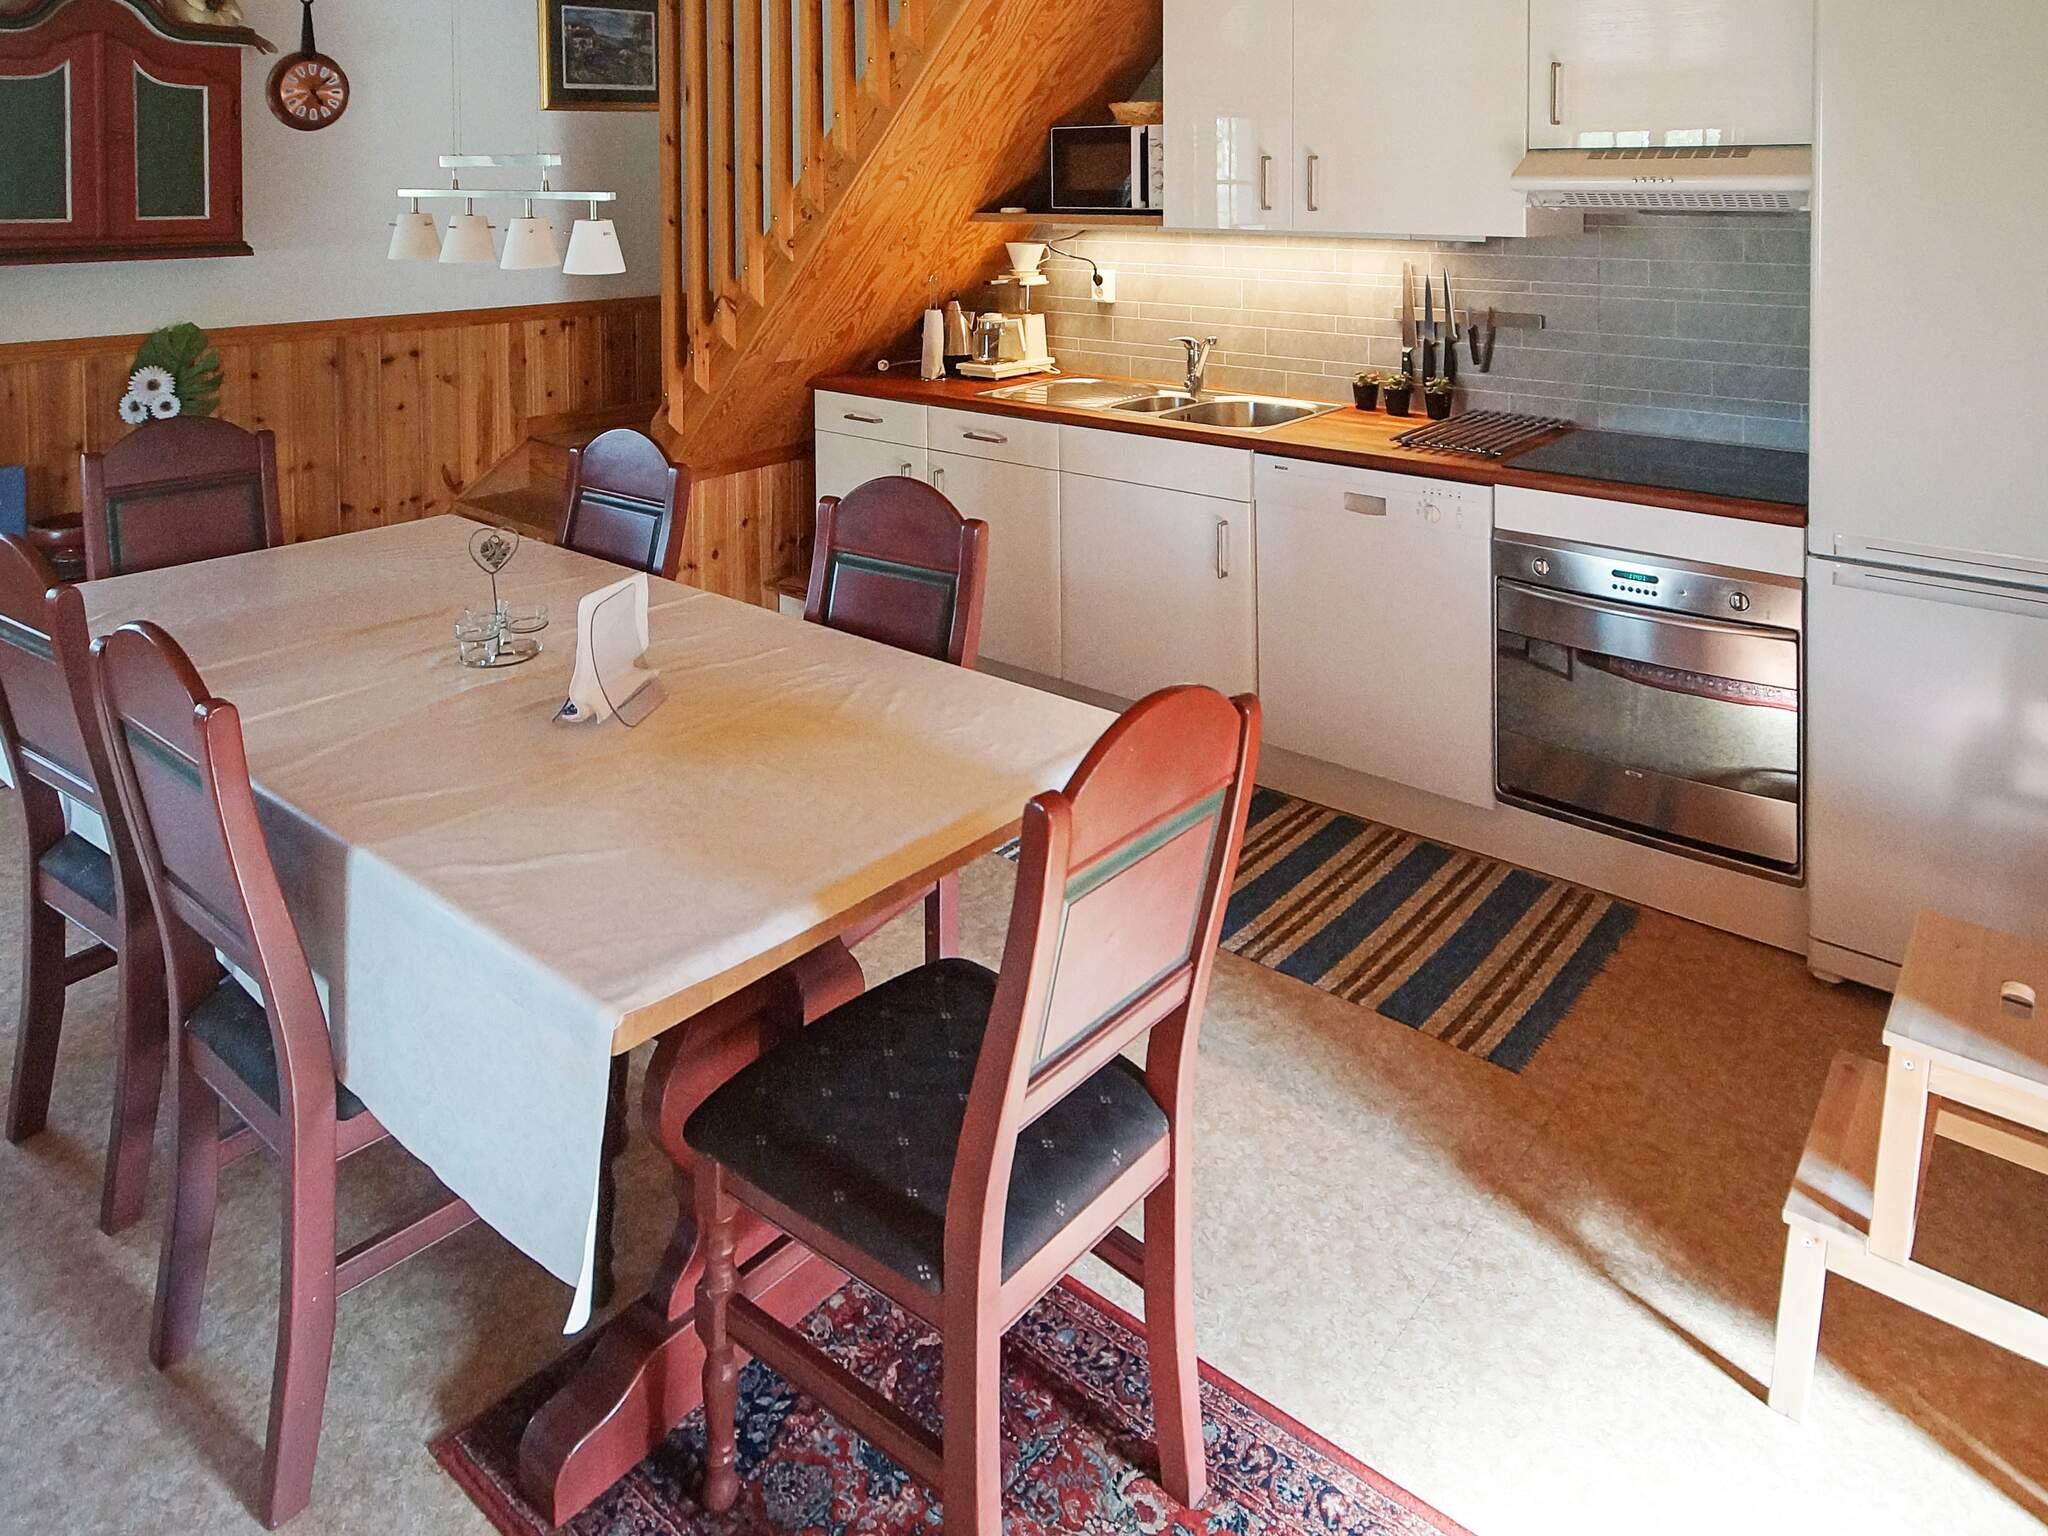 Ferienhaus Kyrknäs (135519), Torsby, Värmlands län, Mittelschweden, Schweden, Bild 3